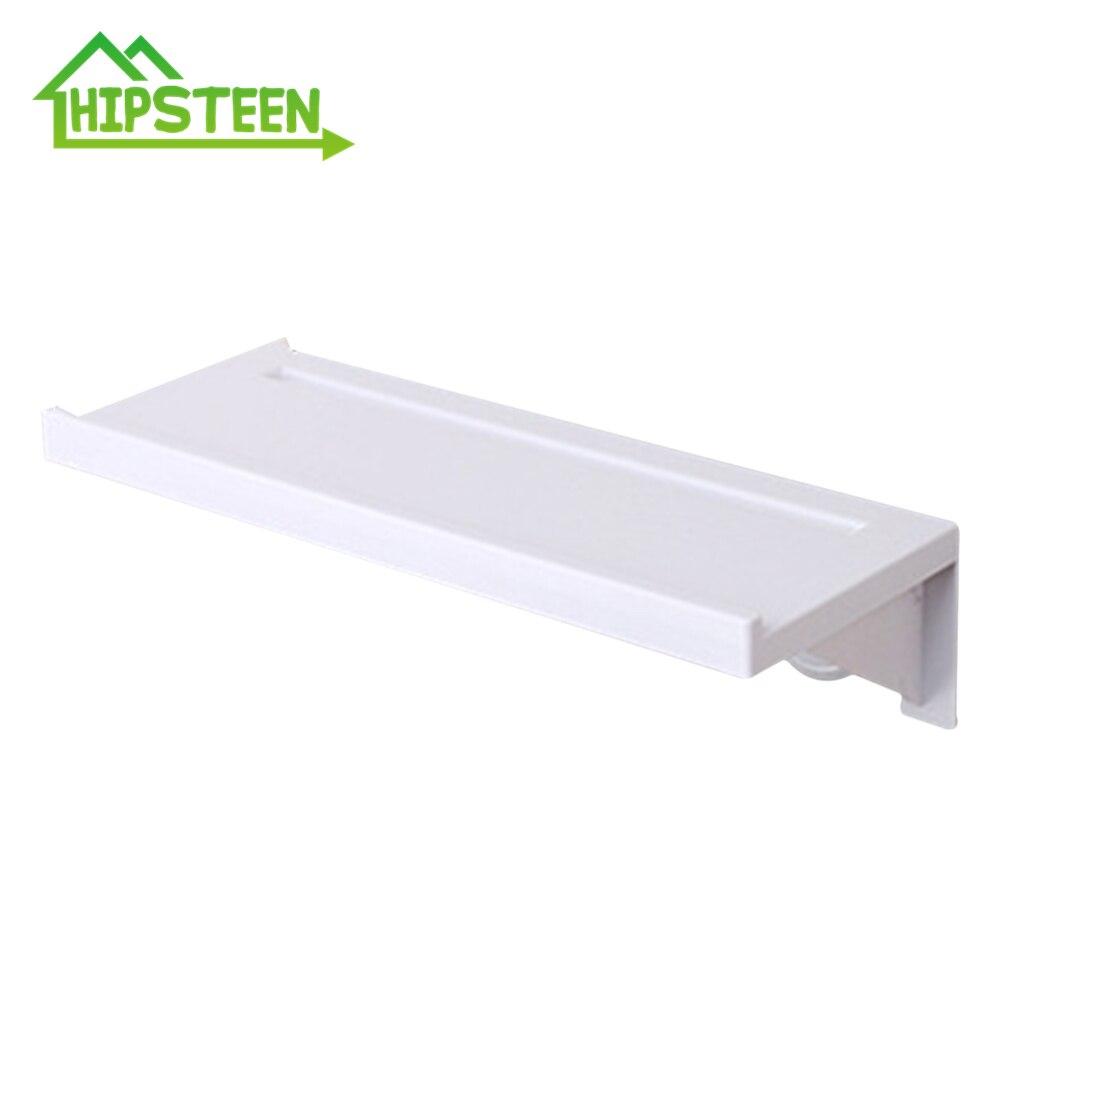 Creative Adhesive Storage Rack Wall Shelf Sundries Holder Bathroom Organizer Hooks On The Wall   Non Trace Stick Type White|Storage Holders & Racks| |  - title=